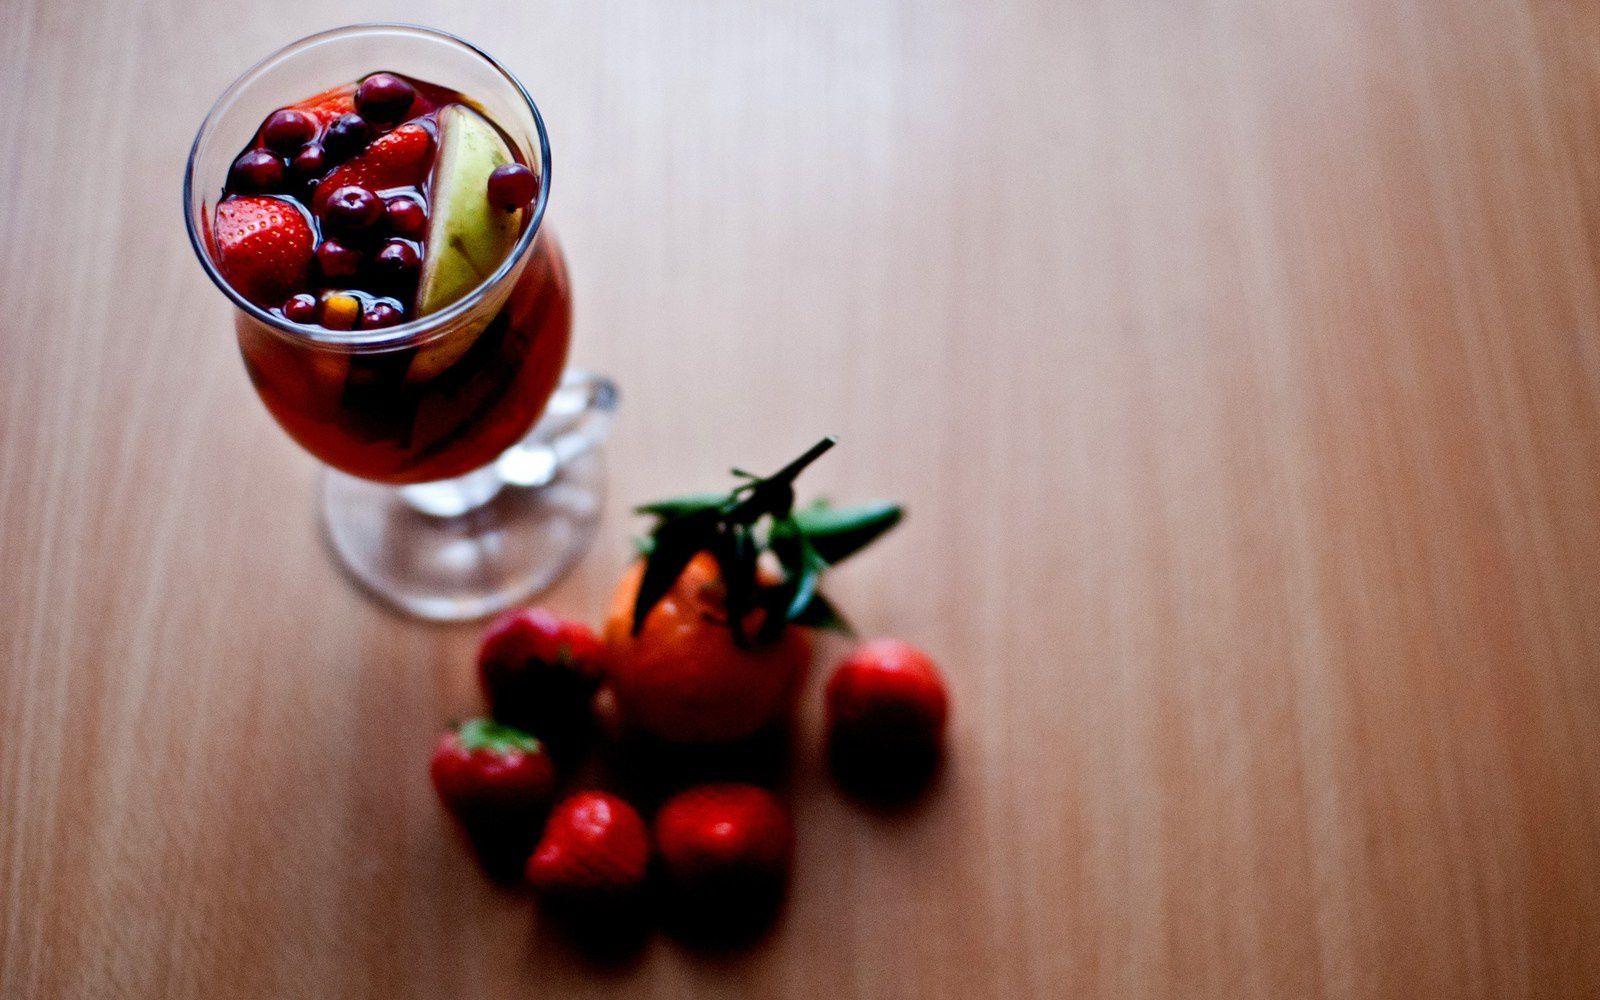 Drink - Fruits - Fraises - Wallpaper - Free